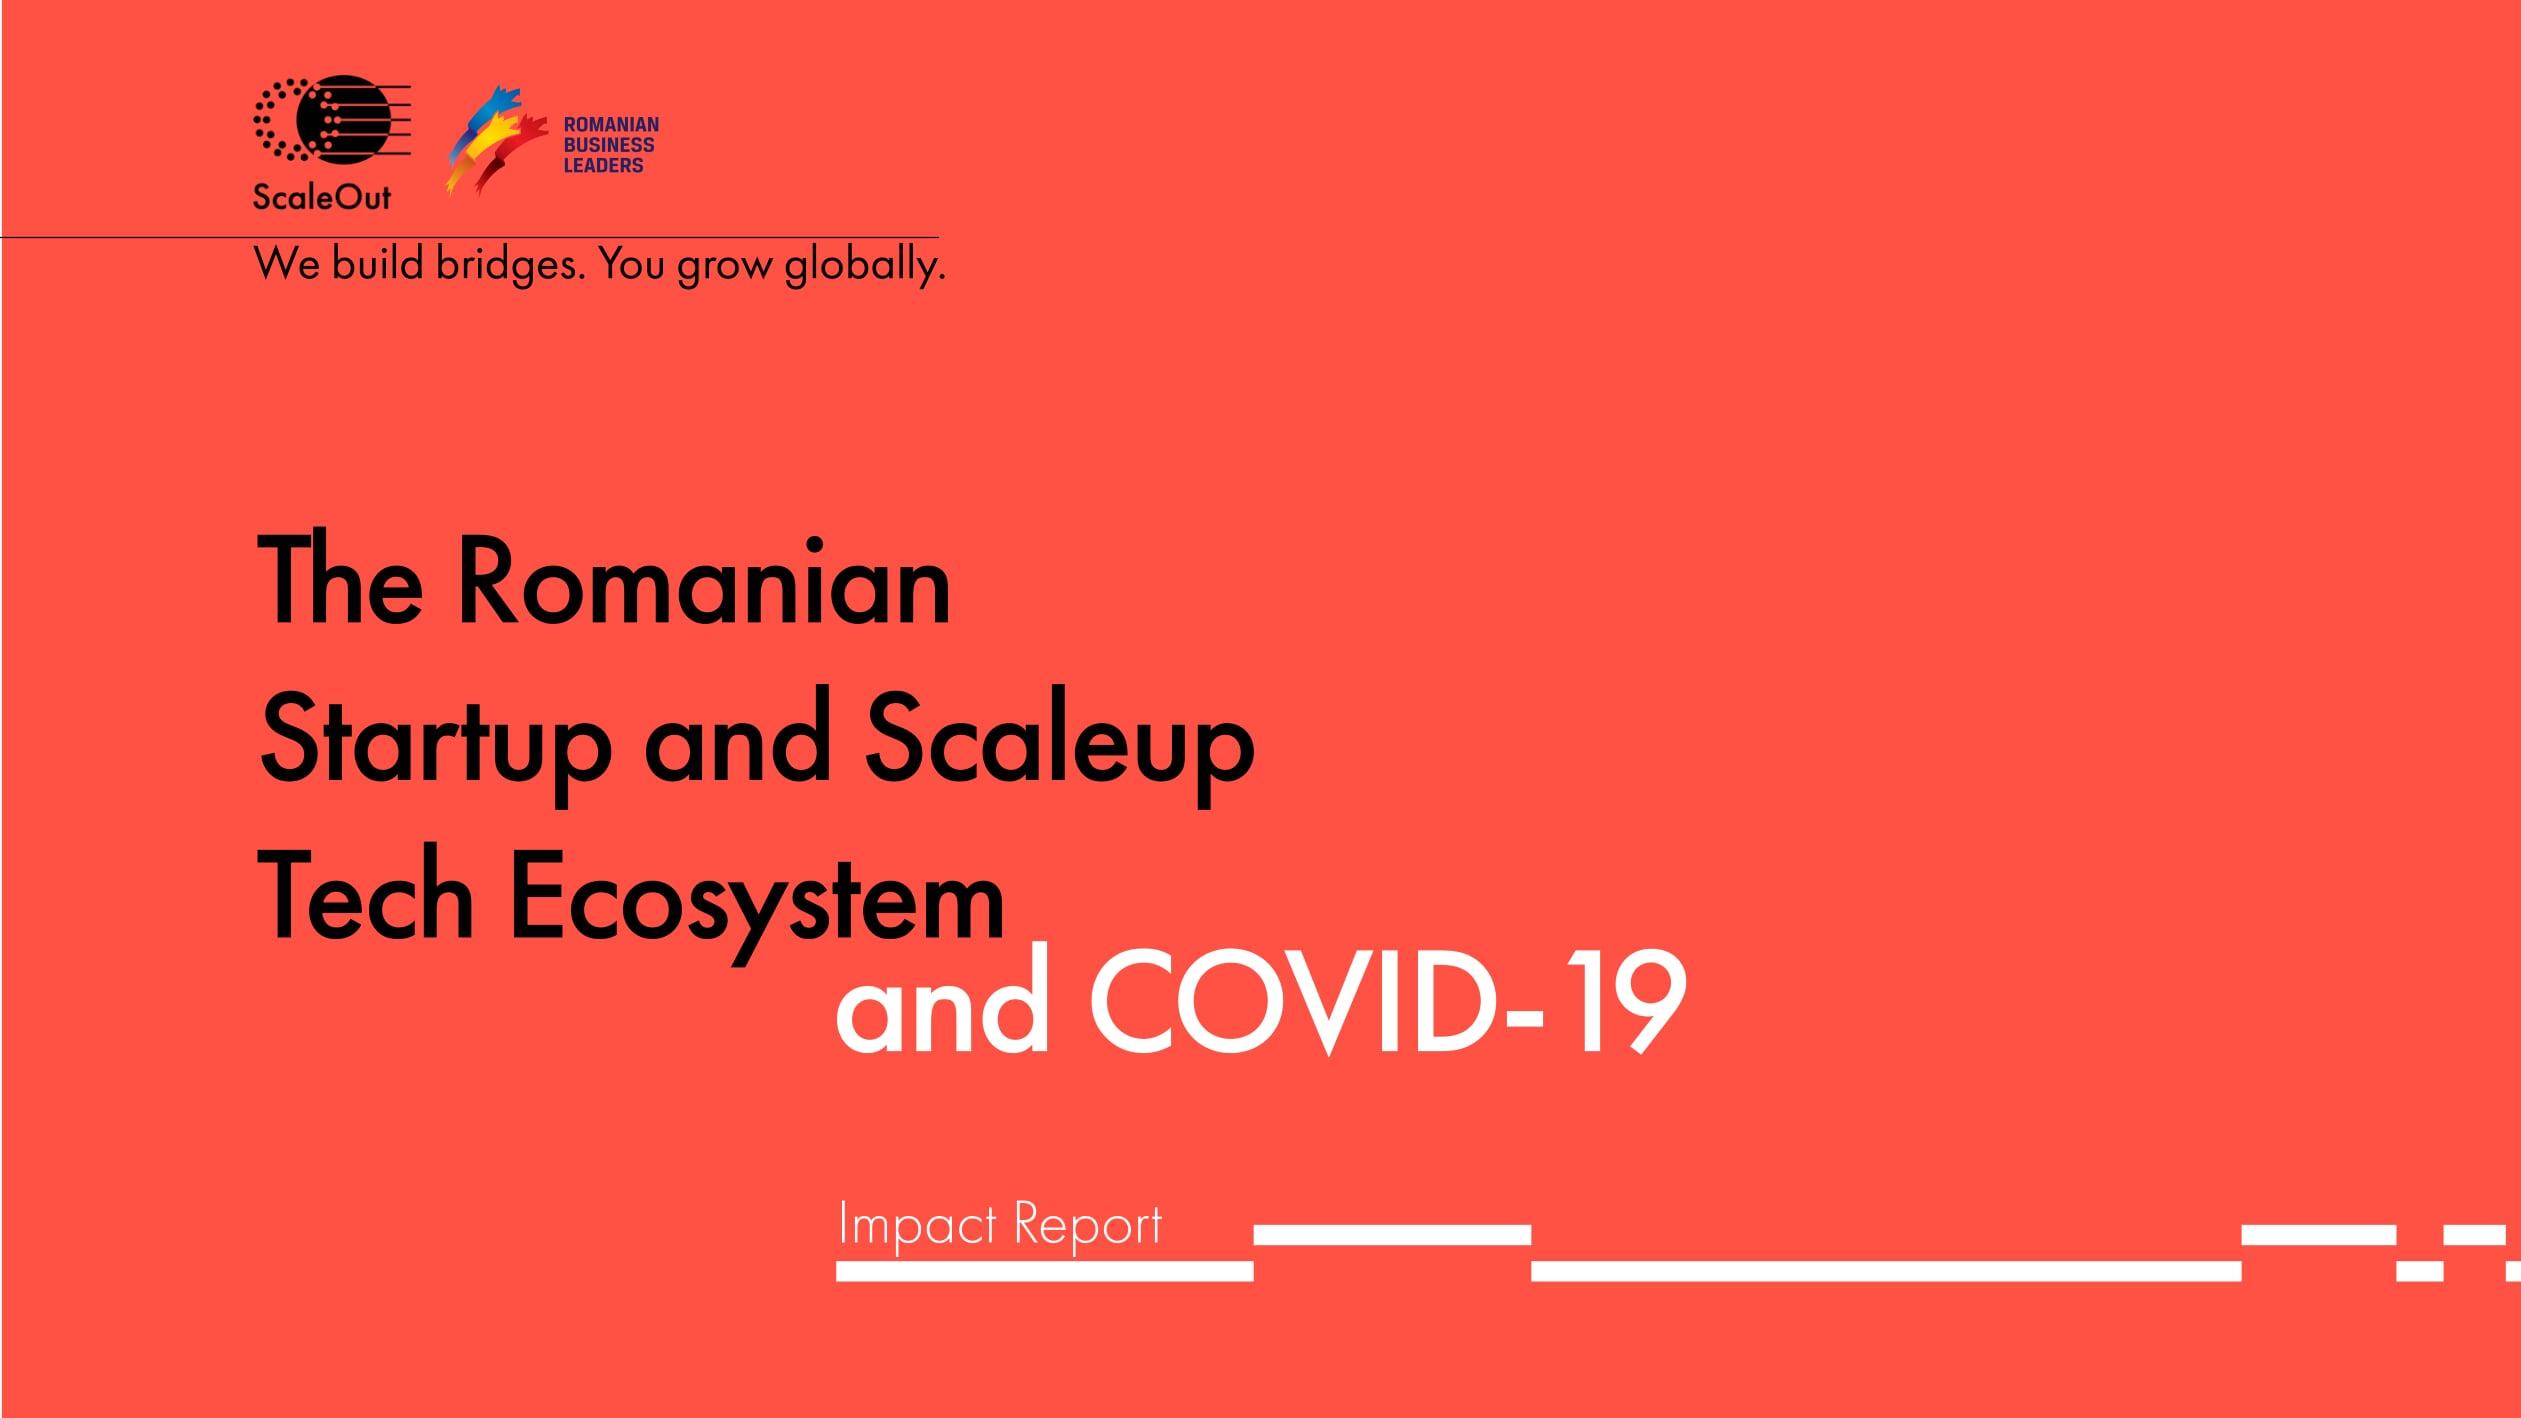 ScaleOut: Covid-19 Impact Survey – Romanian Tech Startups&Scaleups